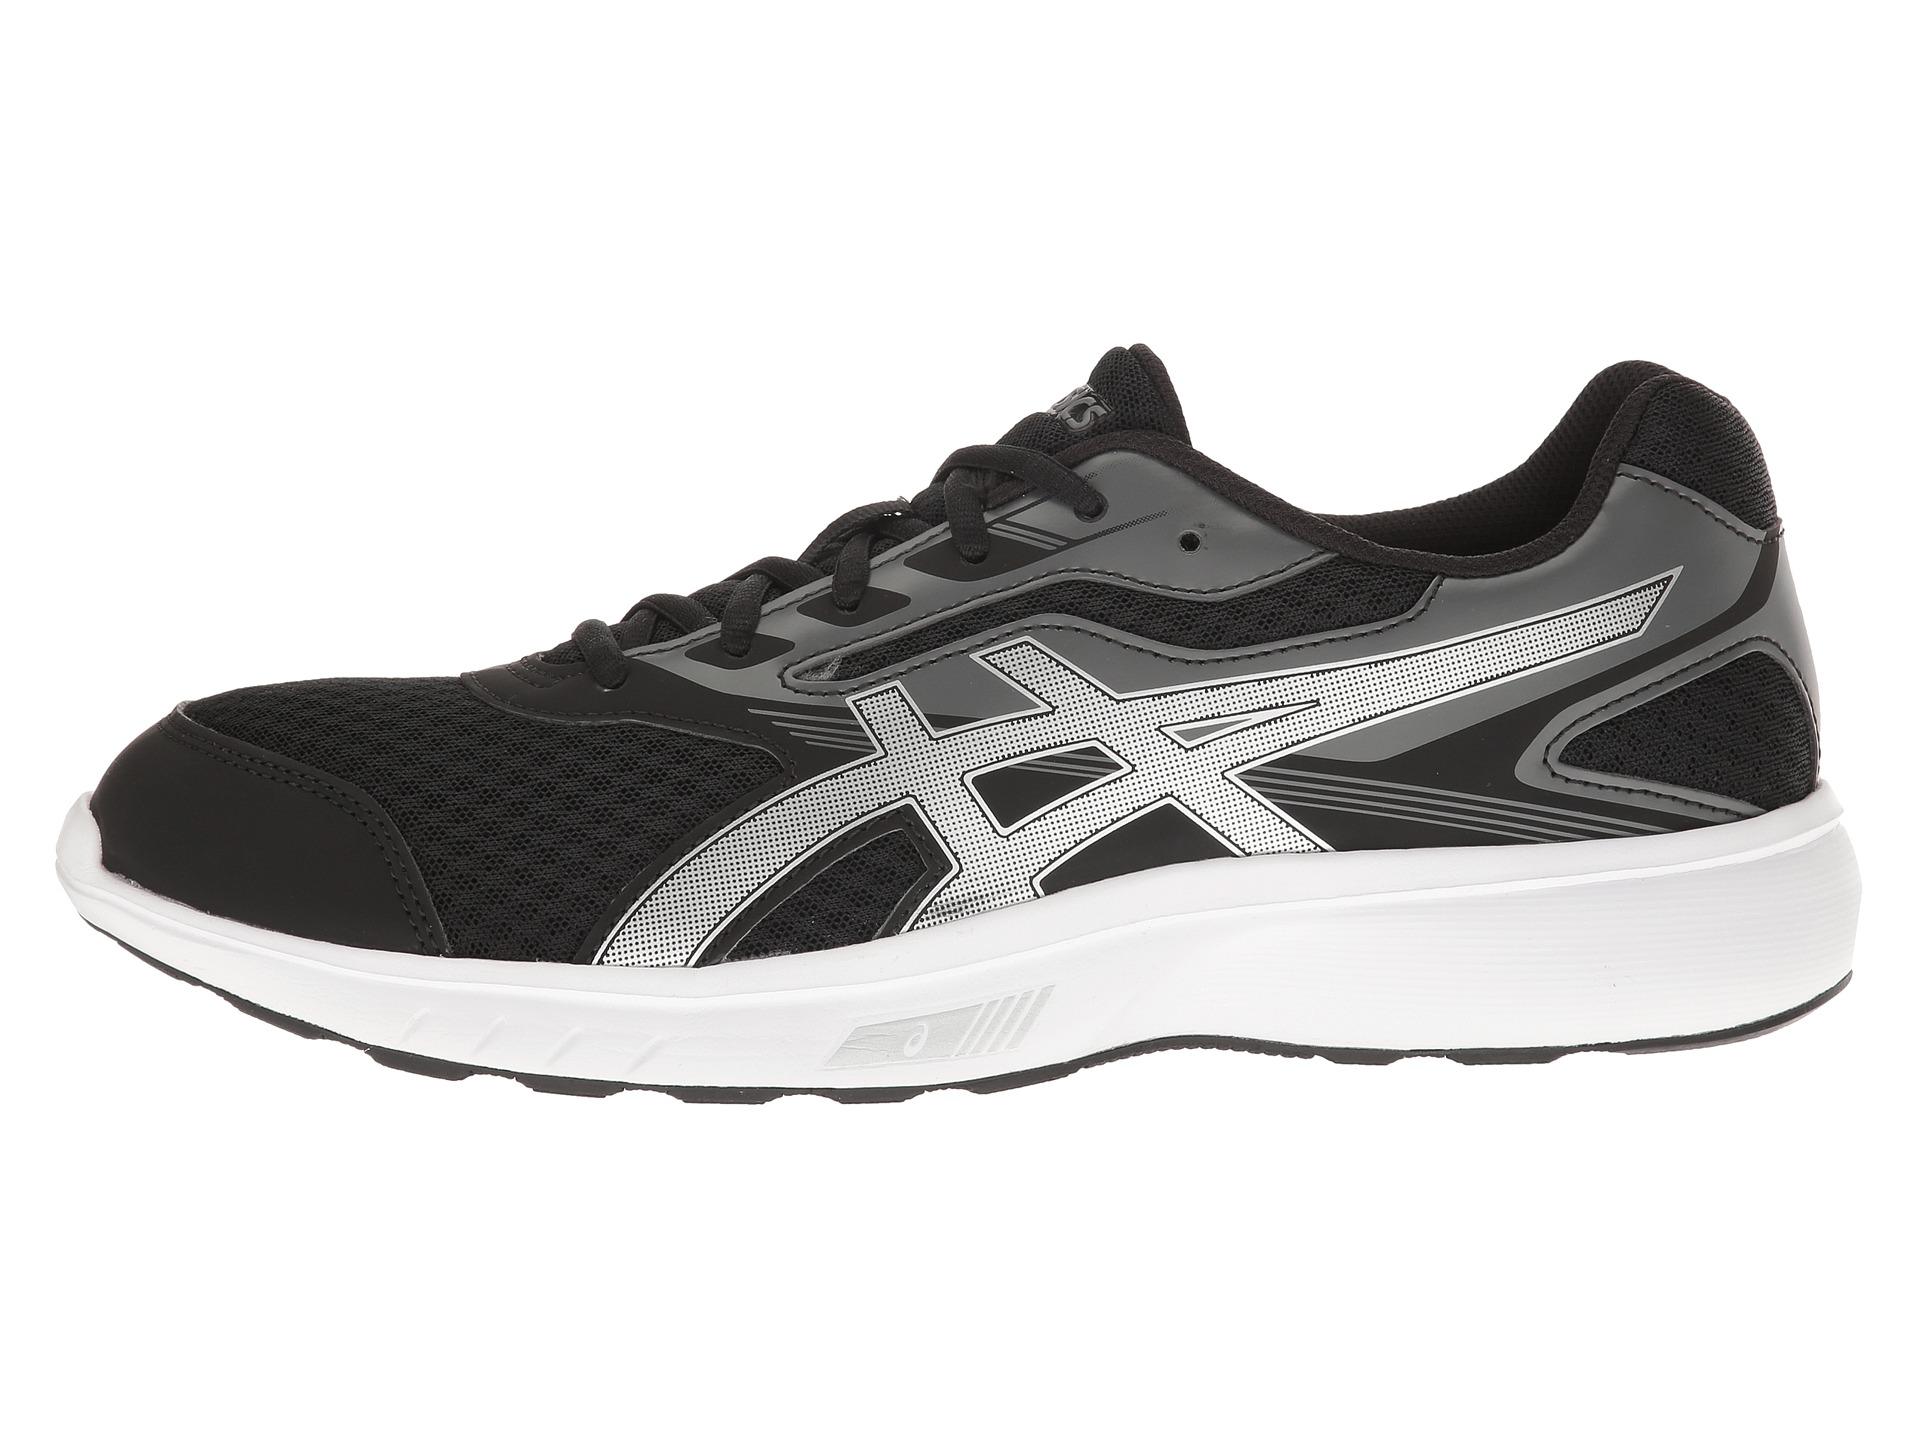 ASICS Men's Stormer Running Shoes $25.99 + Free Shipping